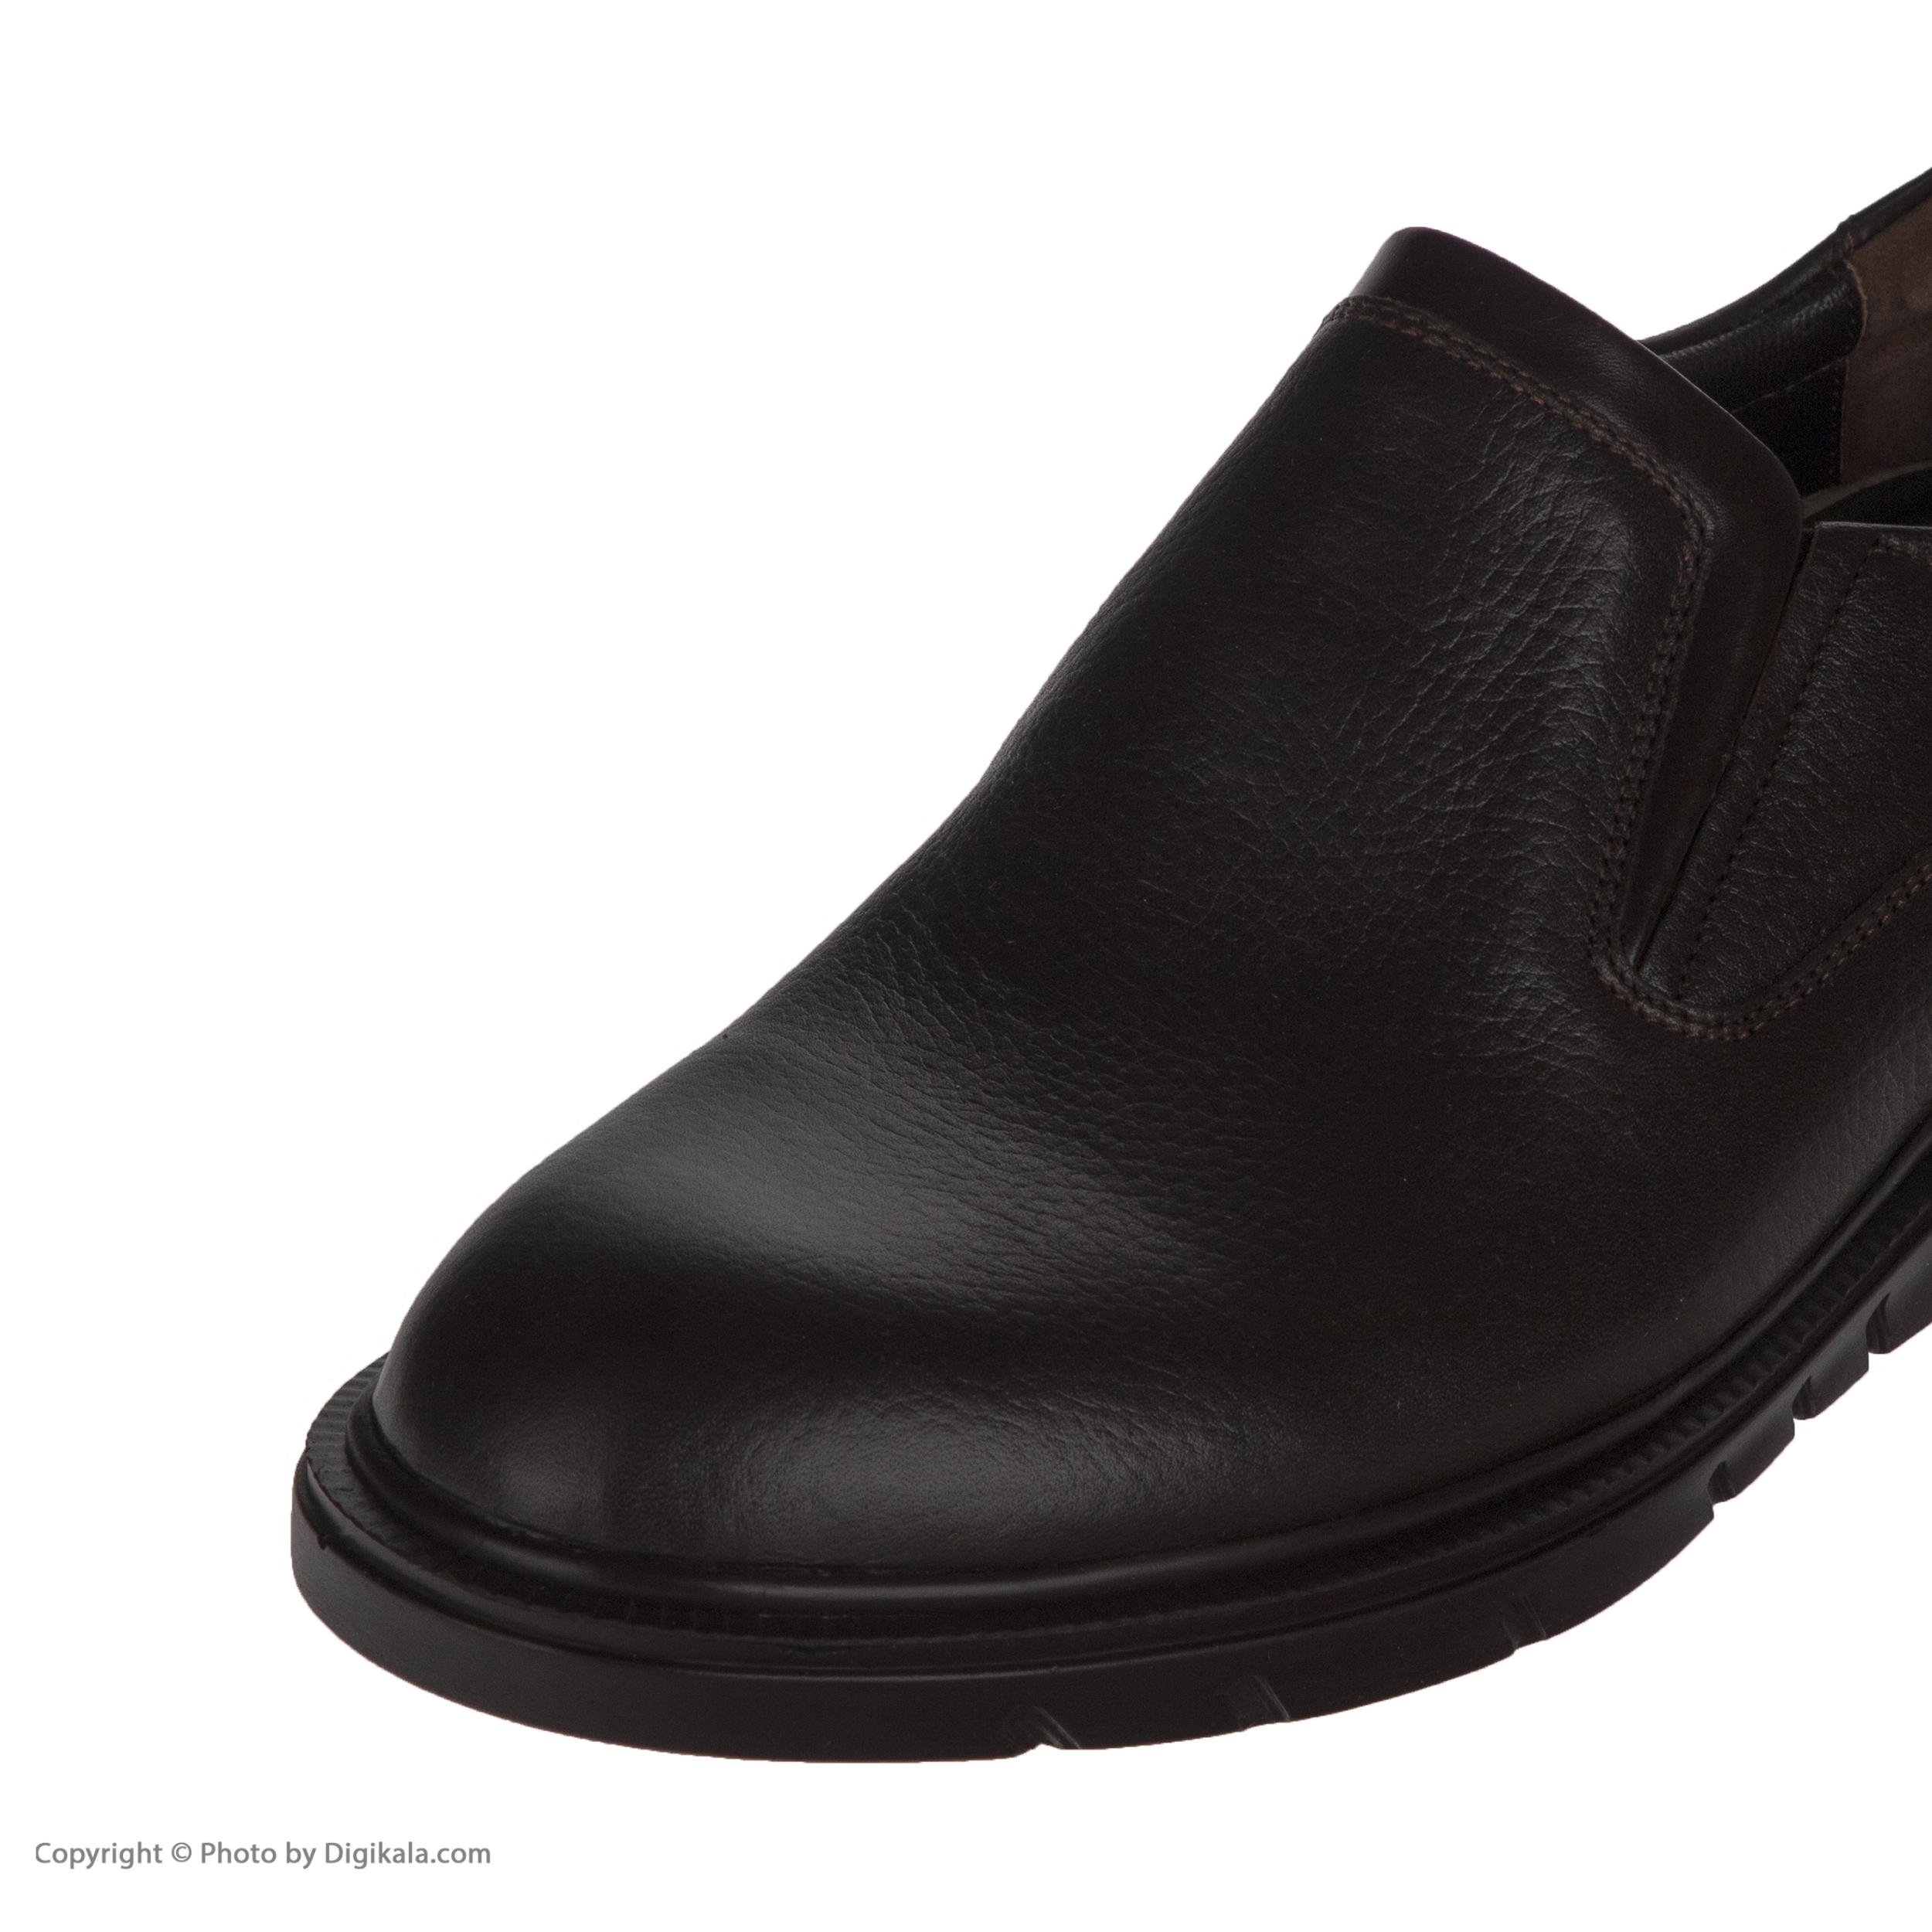 کفش روزمره مردانه بلوط مدل 7240C503104 -  - 8